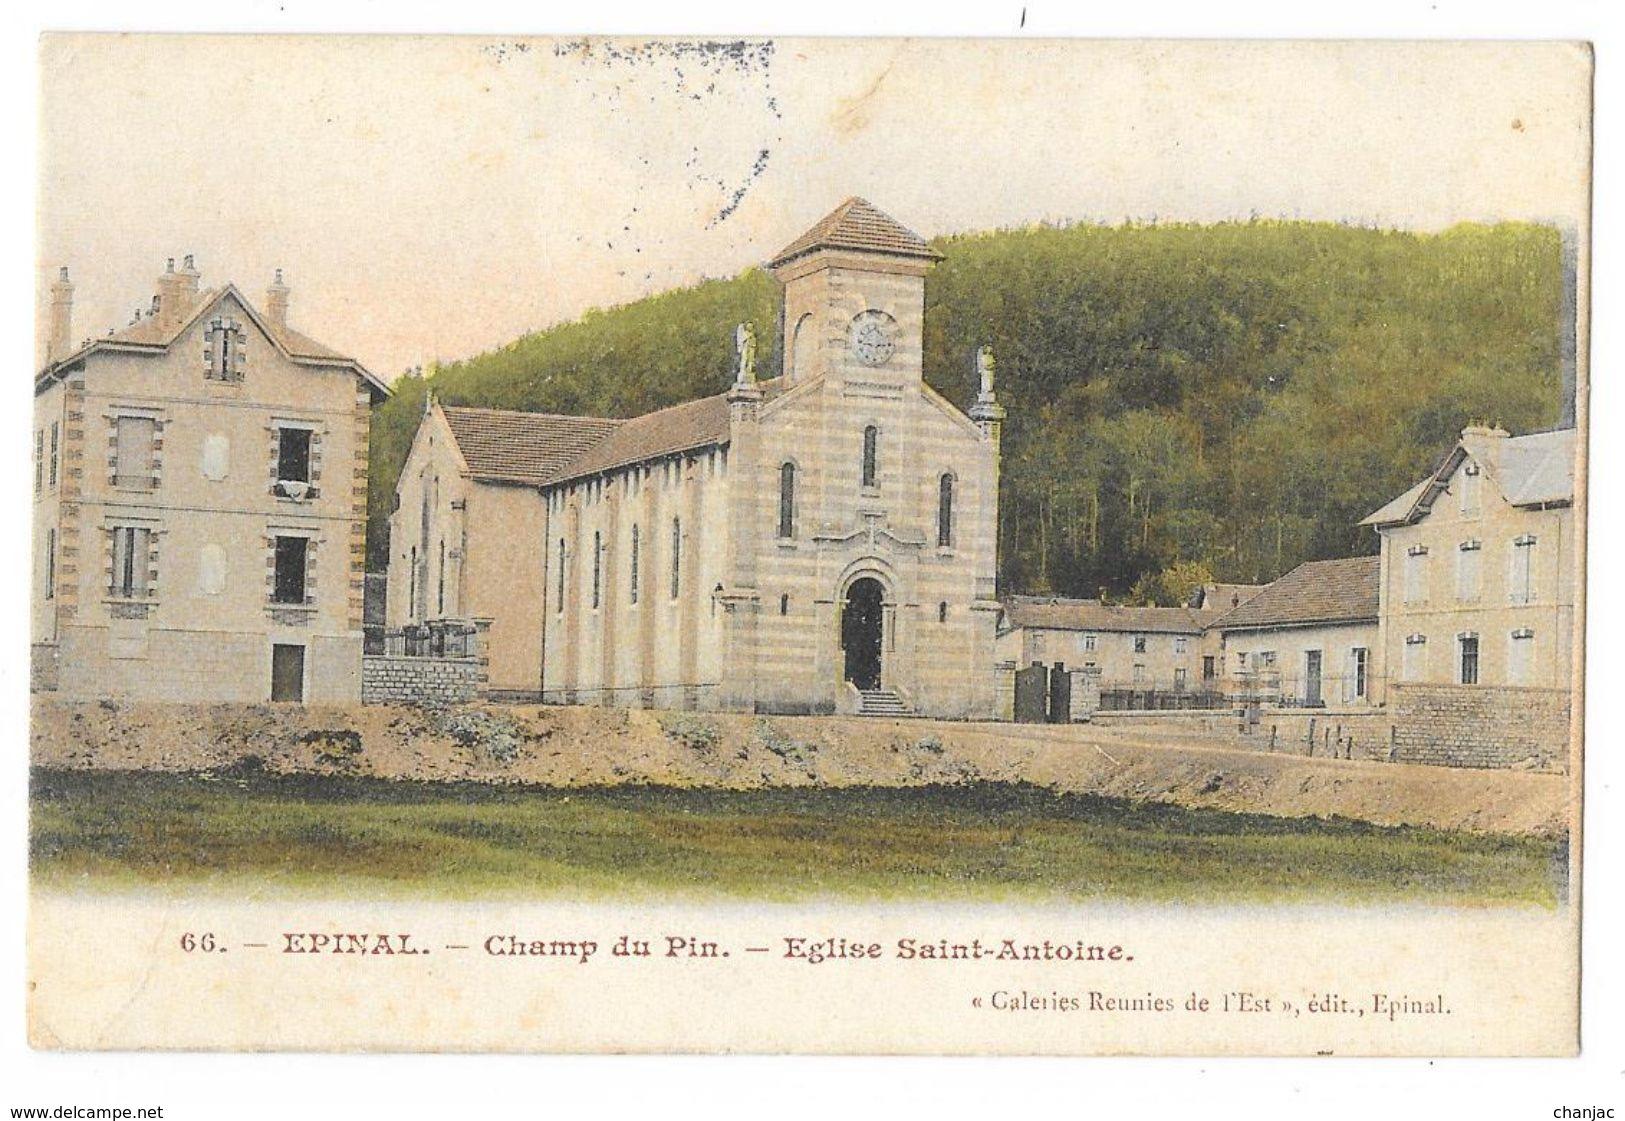 Cpa: 88 EPINAL - Champ Du Pin - Eglise Saint Antoine  1905  N° 66 - Epinal